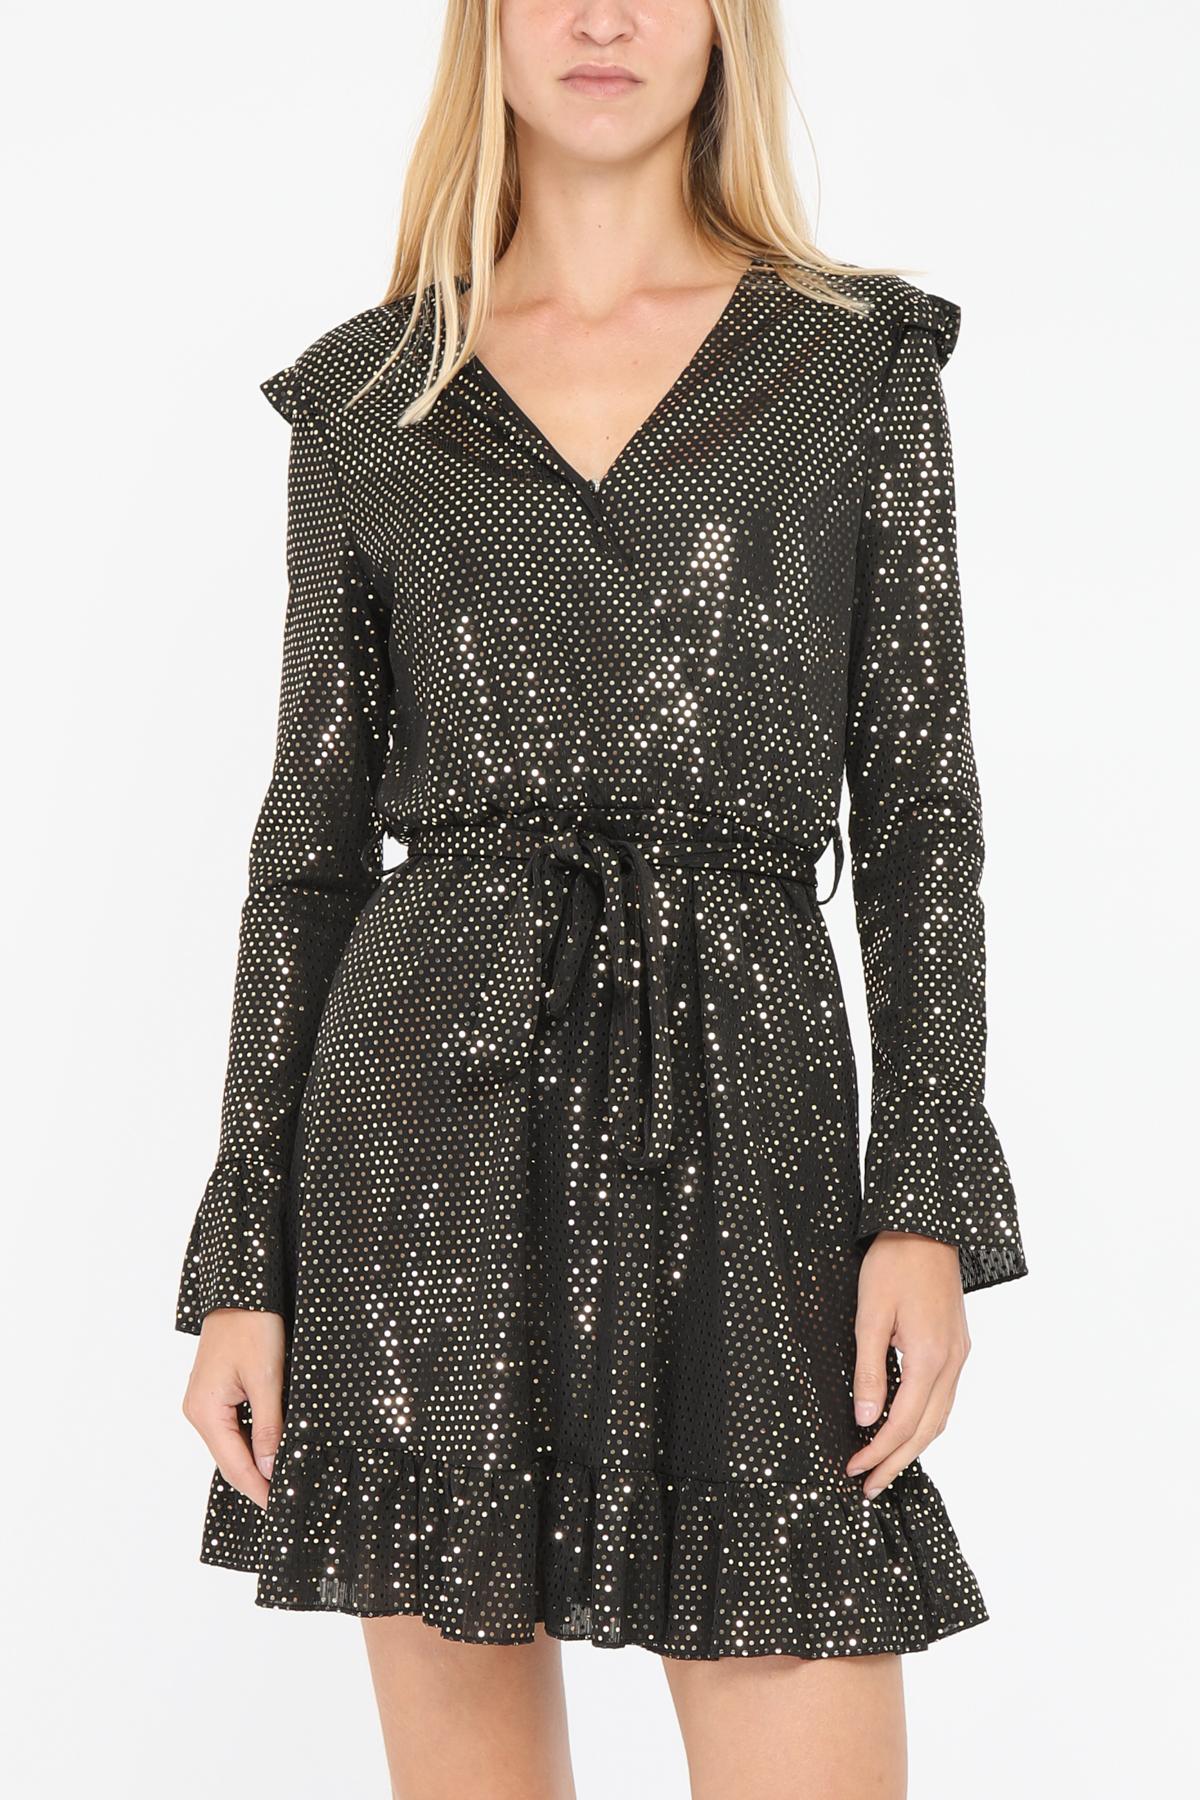 Robes courtes Femme Or By Clara F8041 #c eFashion Paris